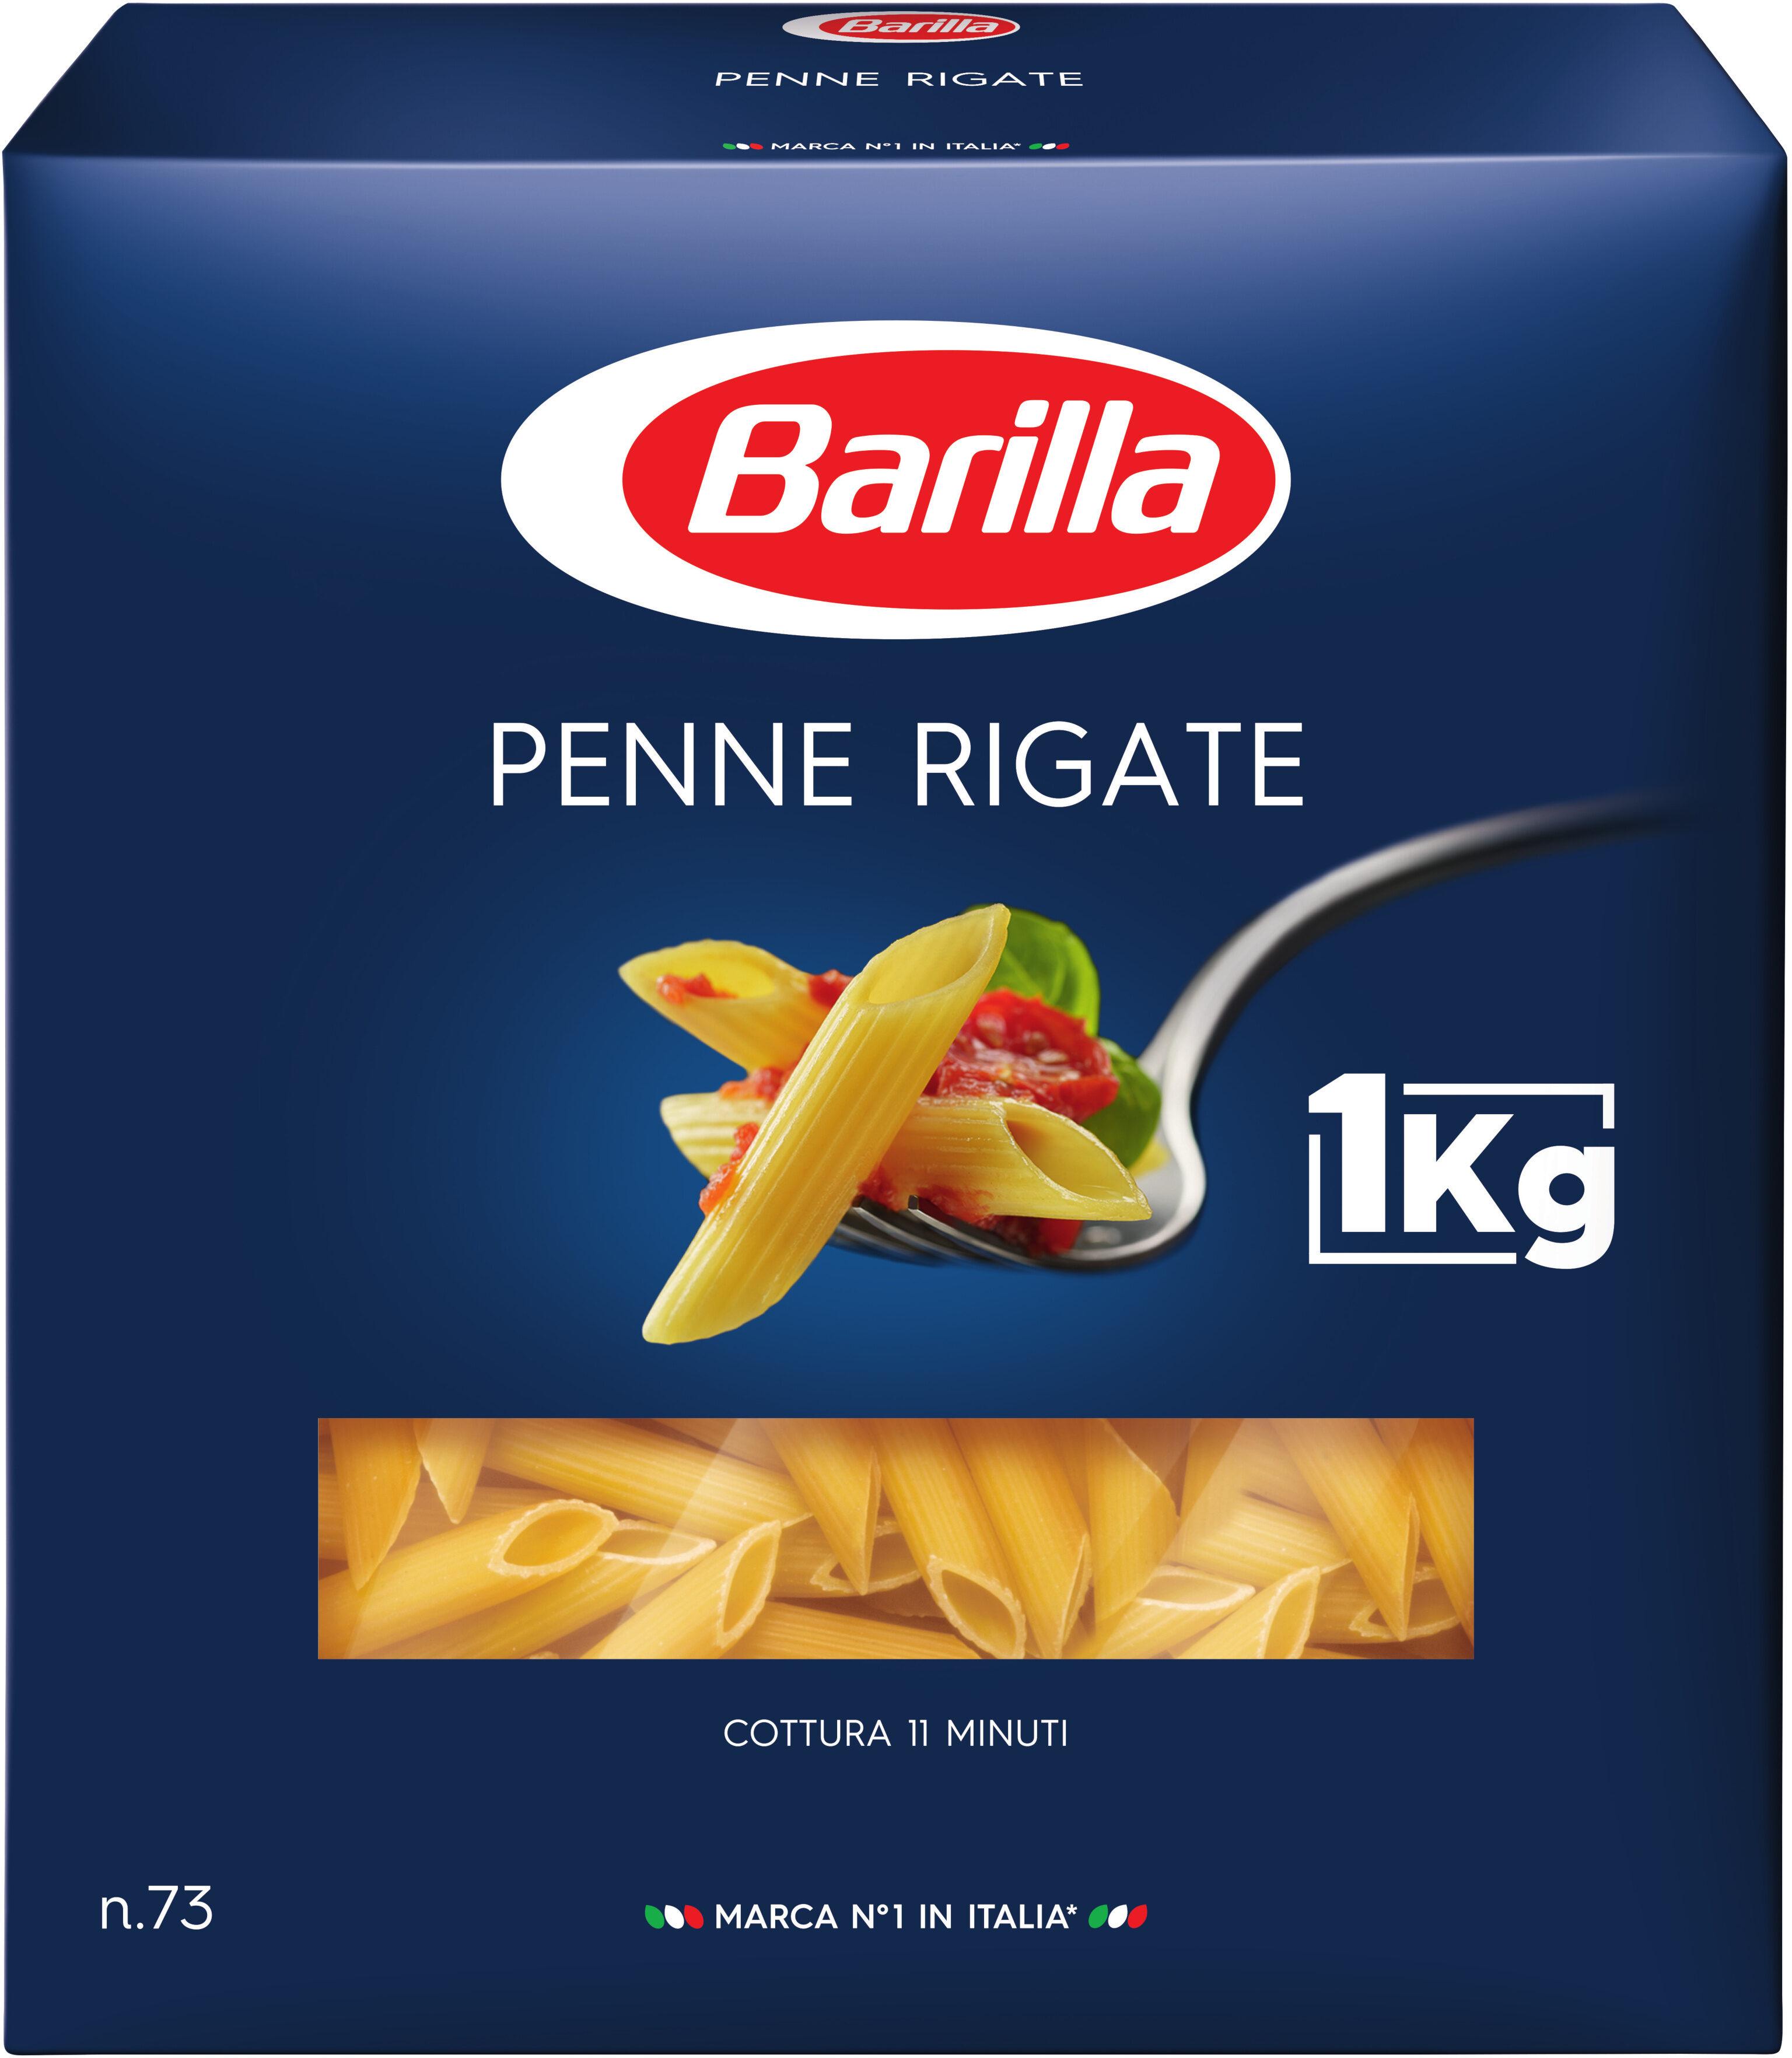 Penne rigate, Barilla (1 kg)